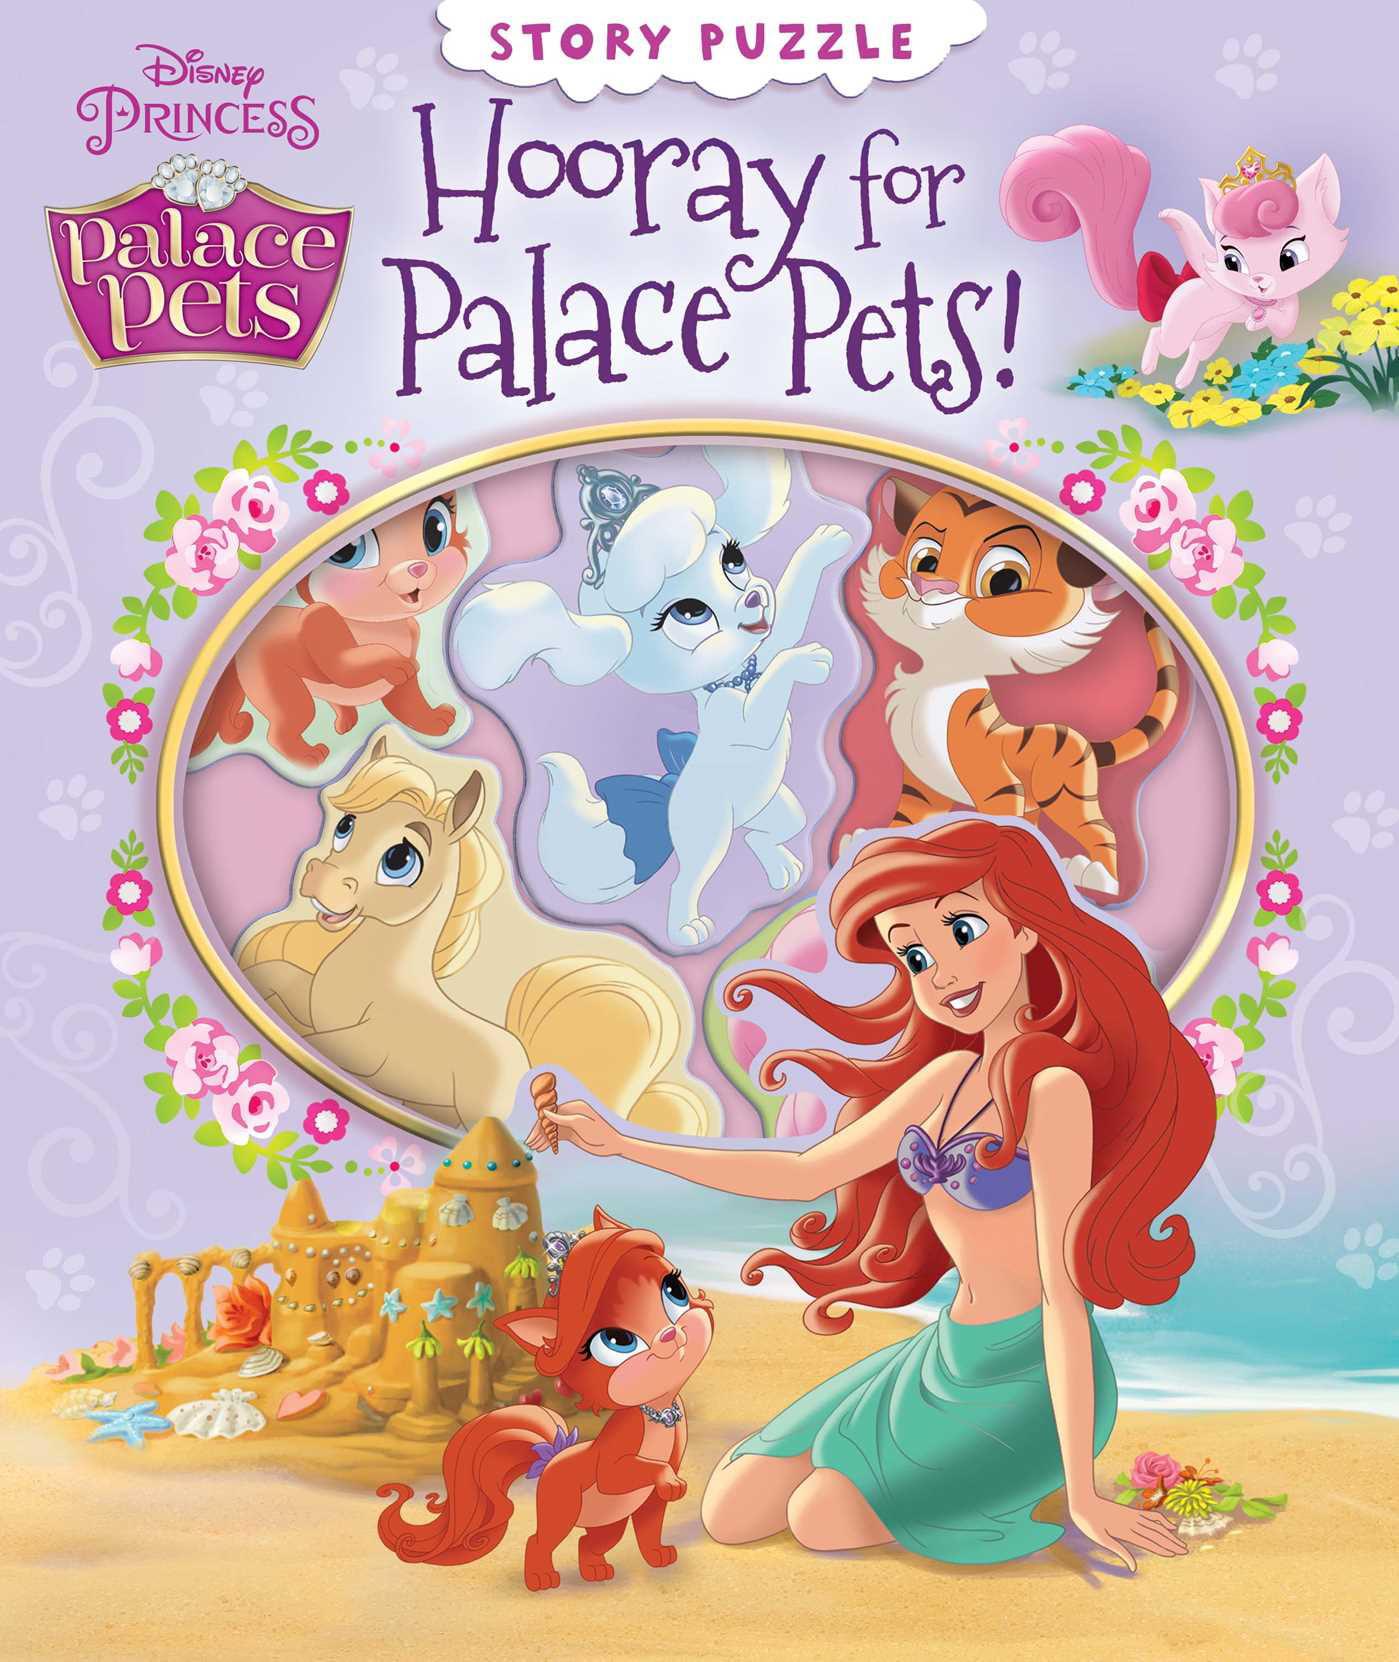 Disney Princess Palace Pets Hooray For